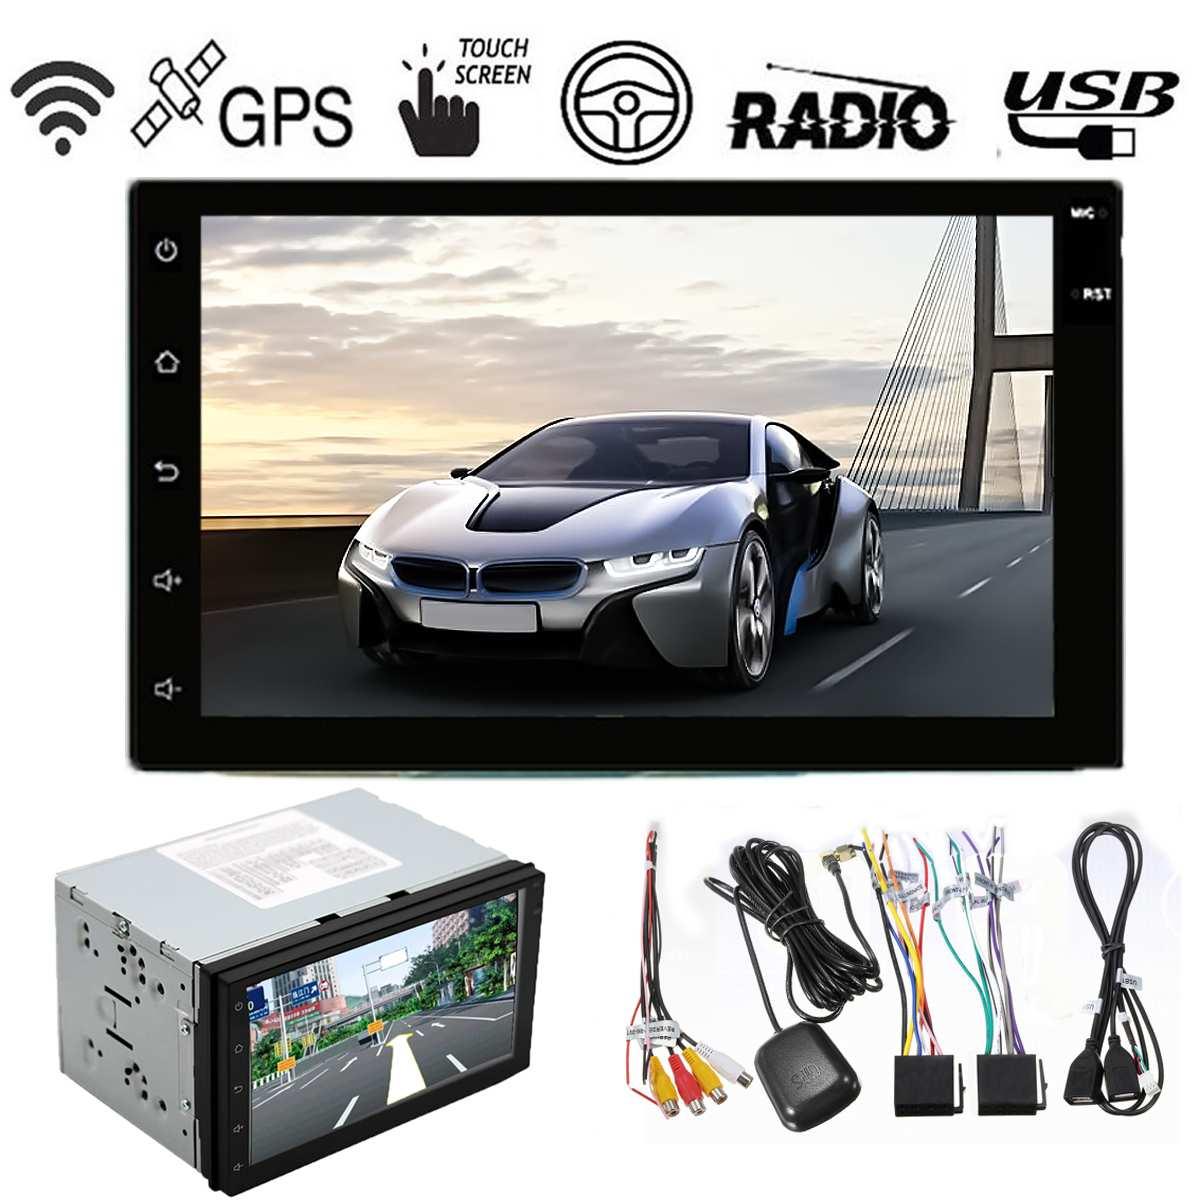 REPRODUCTOR DE MP5 con Radio para coche 2 DIN, 7 pulgadas, Android 6,0, WIFI, estéreo, pantalla táctil, reproductor Multimedia HD para coche con GPS de 16GB